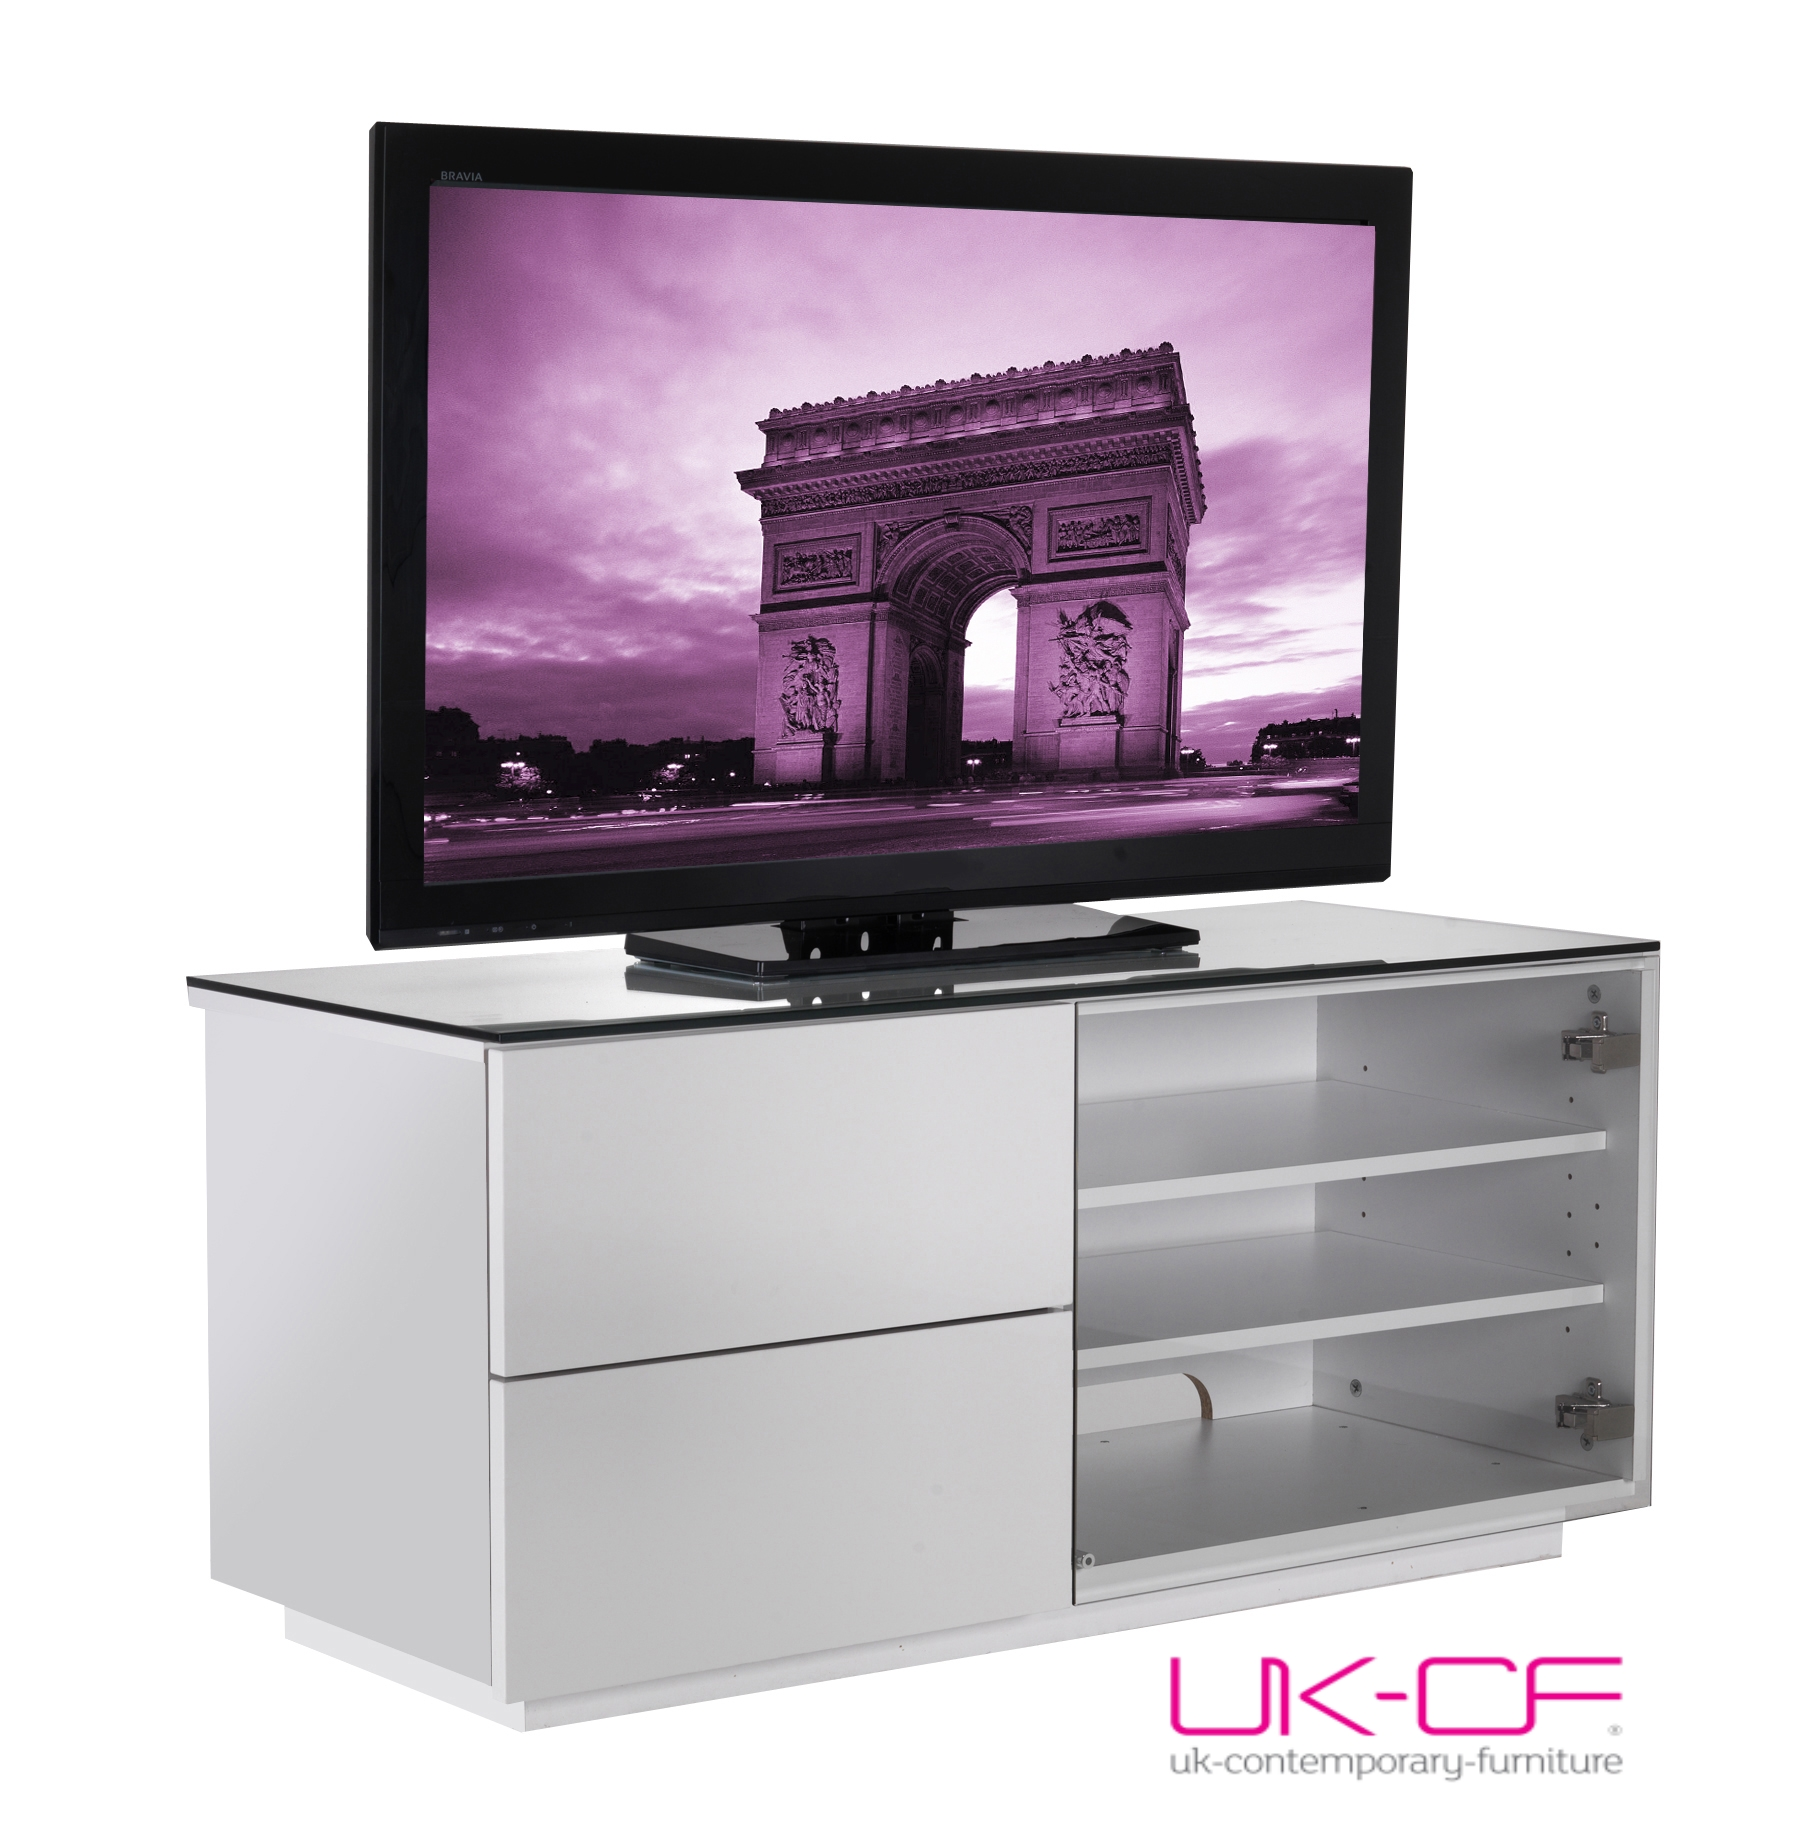 Ukcf brand white gloss 2 drawer lcd plasma tv cabinet for White plasma tv stands